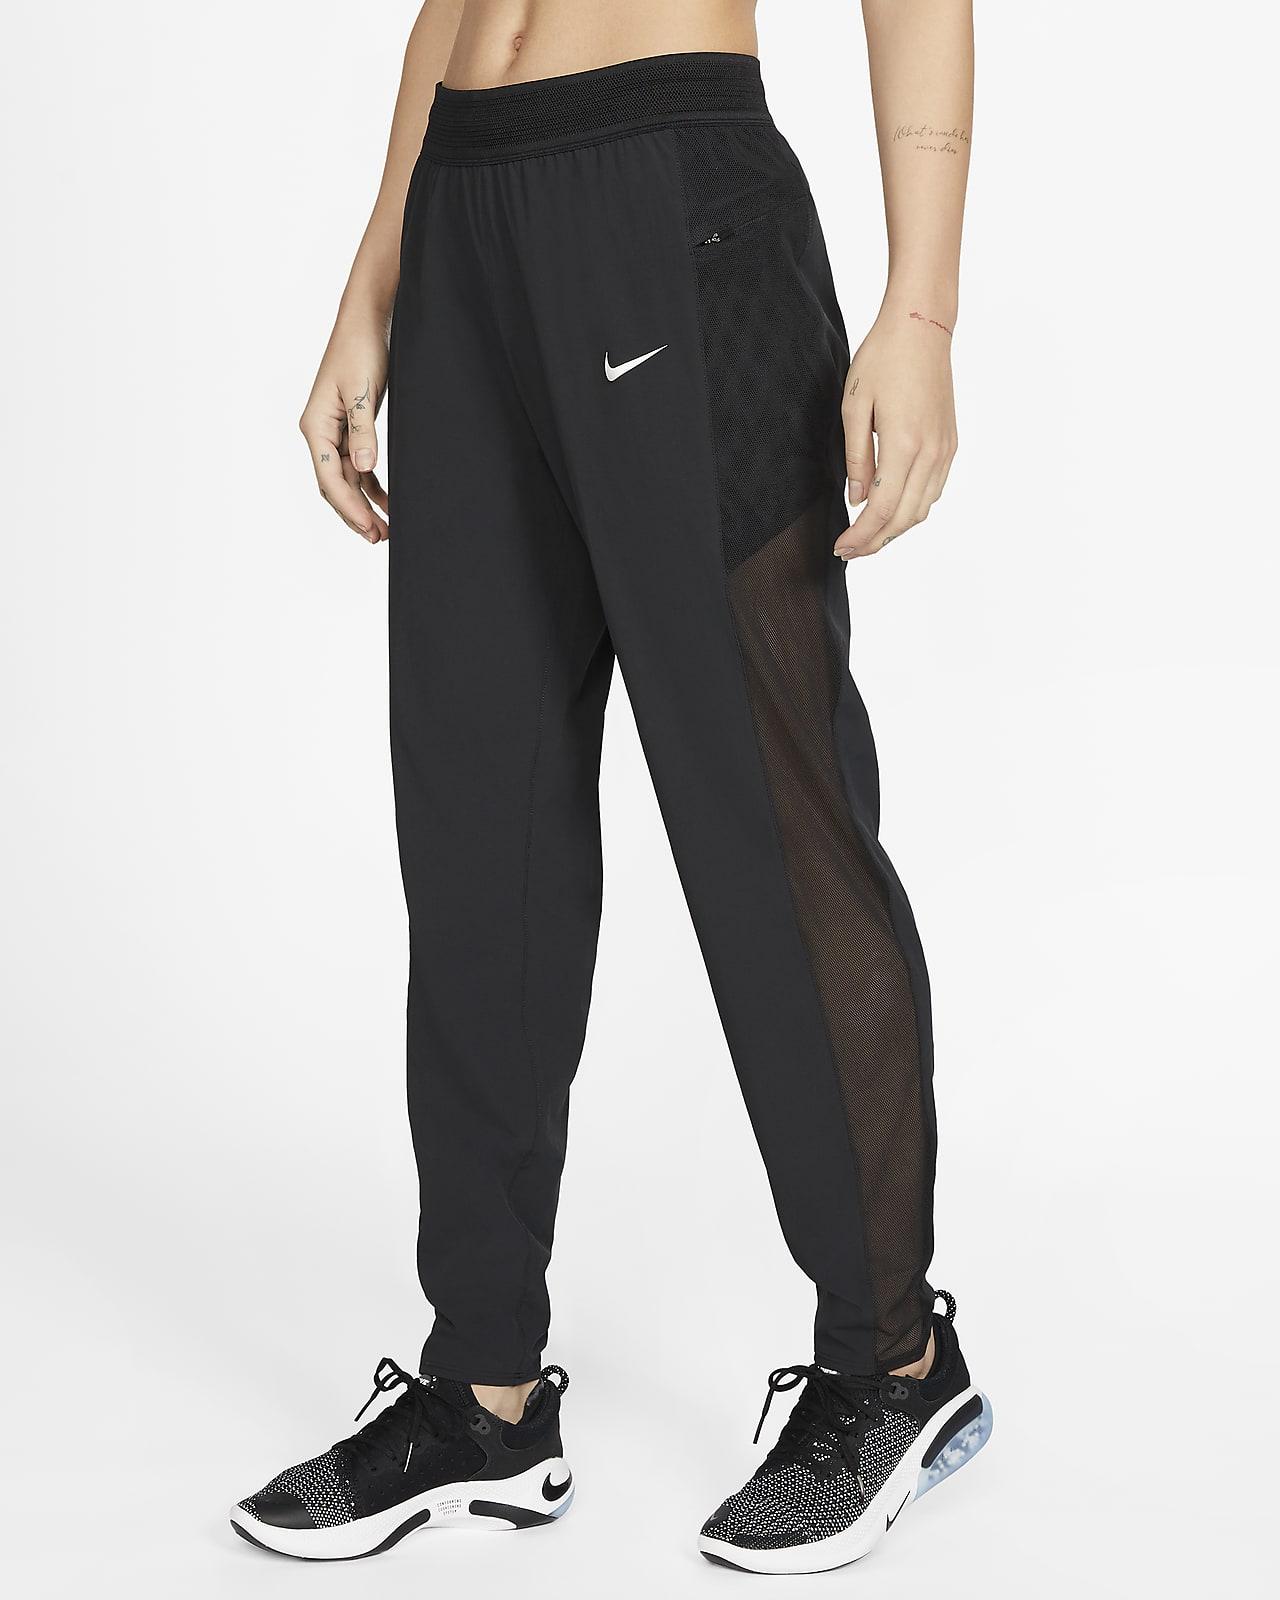 Nike Essential løpebukse for dame